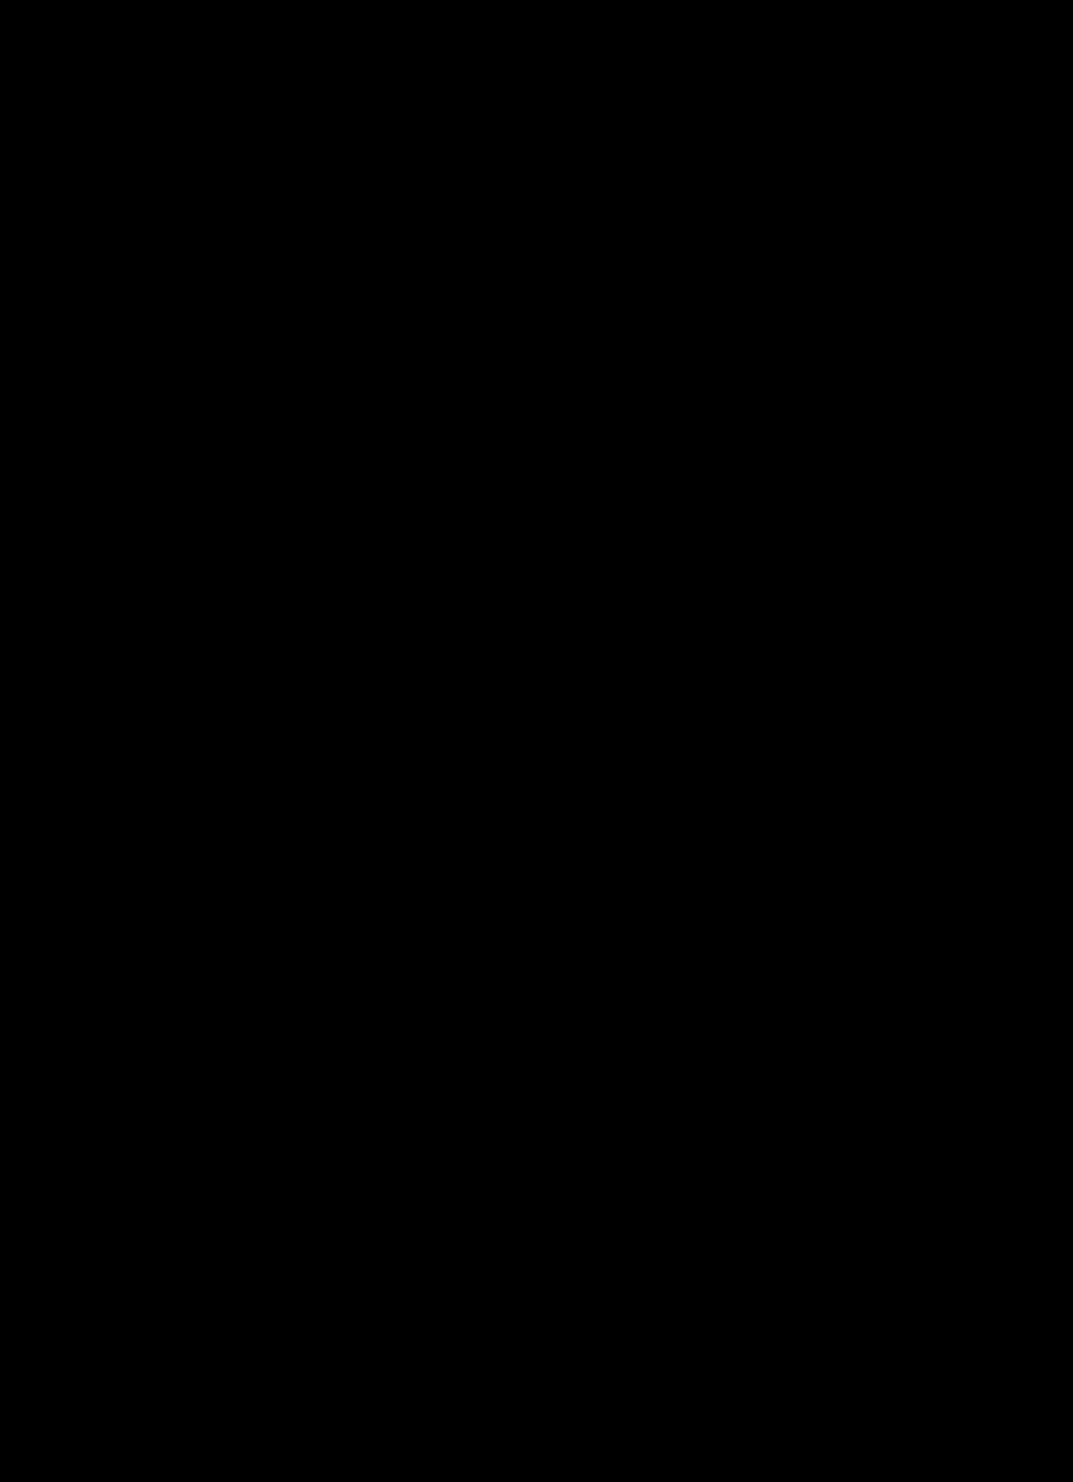 ingresso-hacienda-ochil